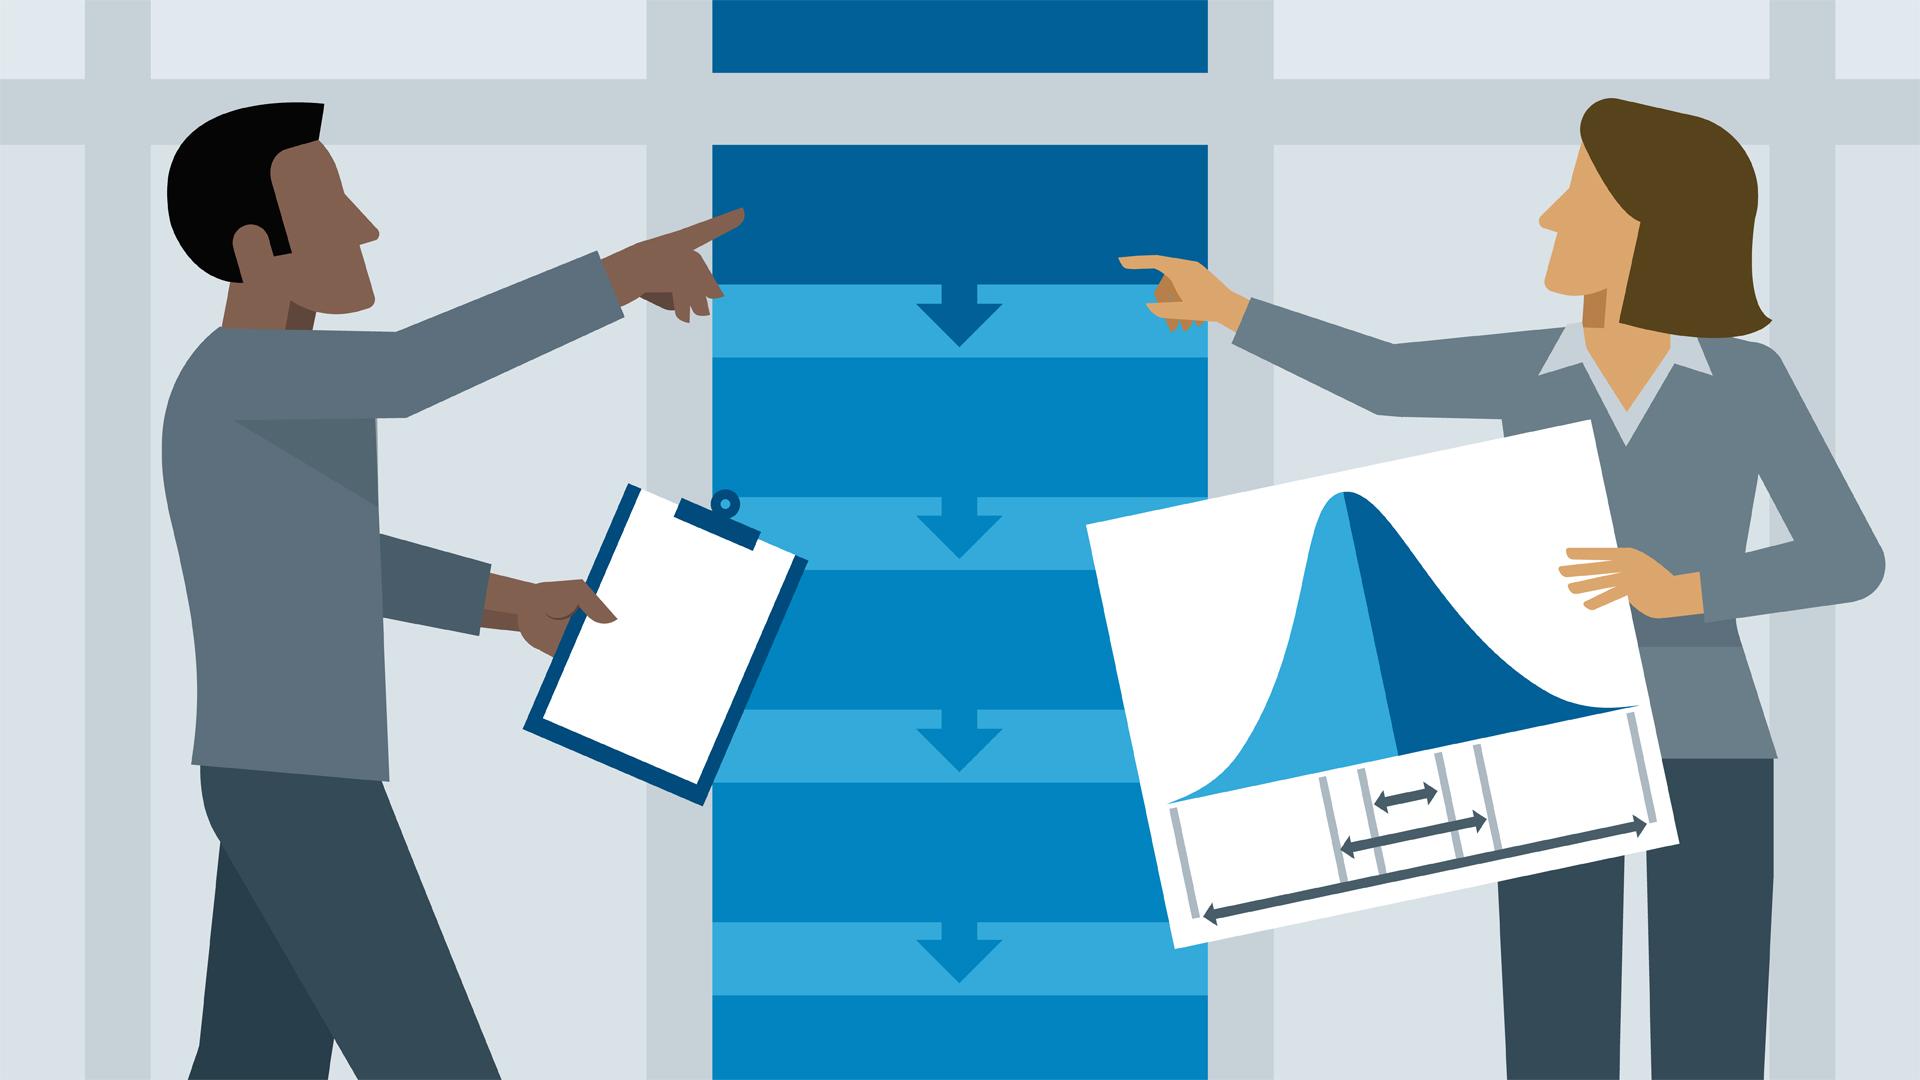 Lean Six Sigma: Define and Measure Tools